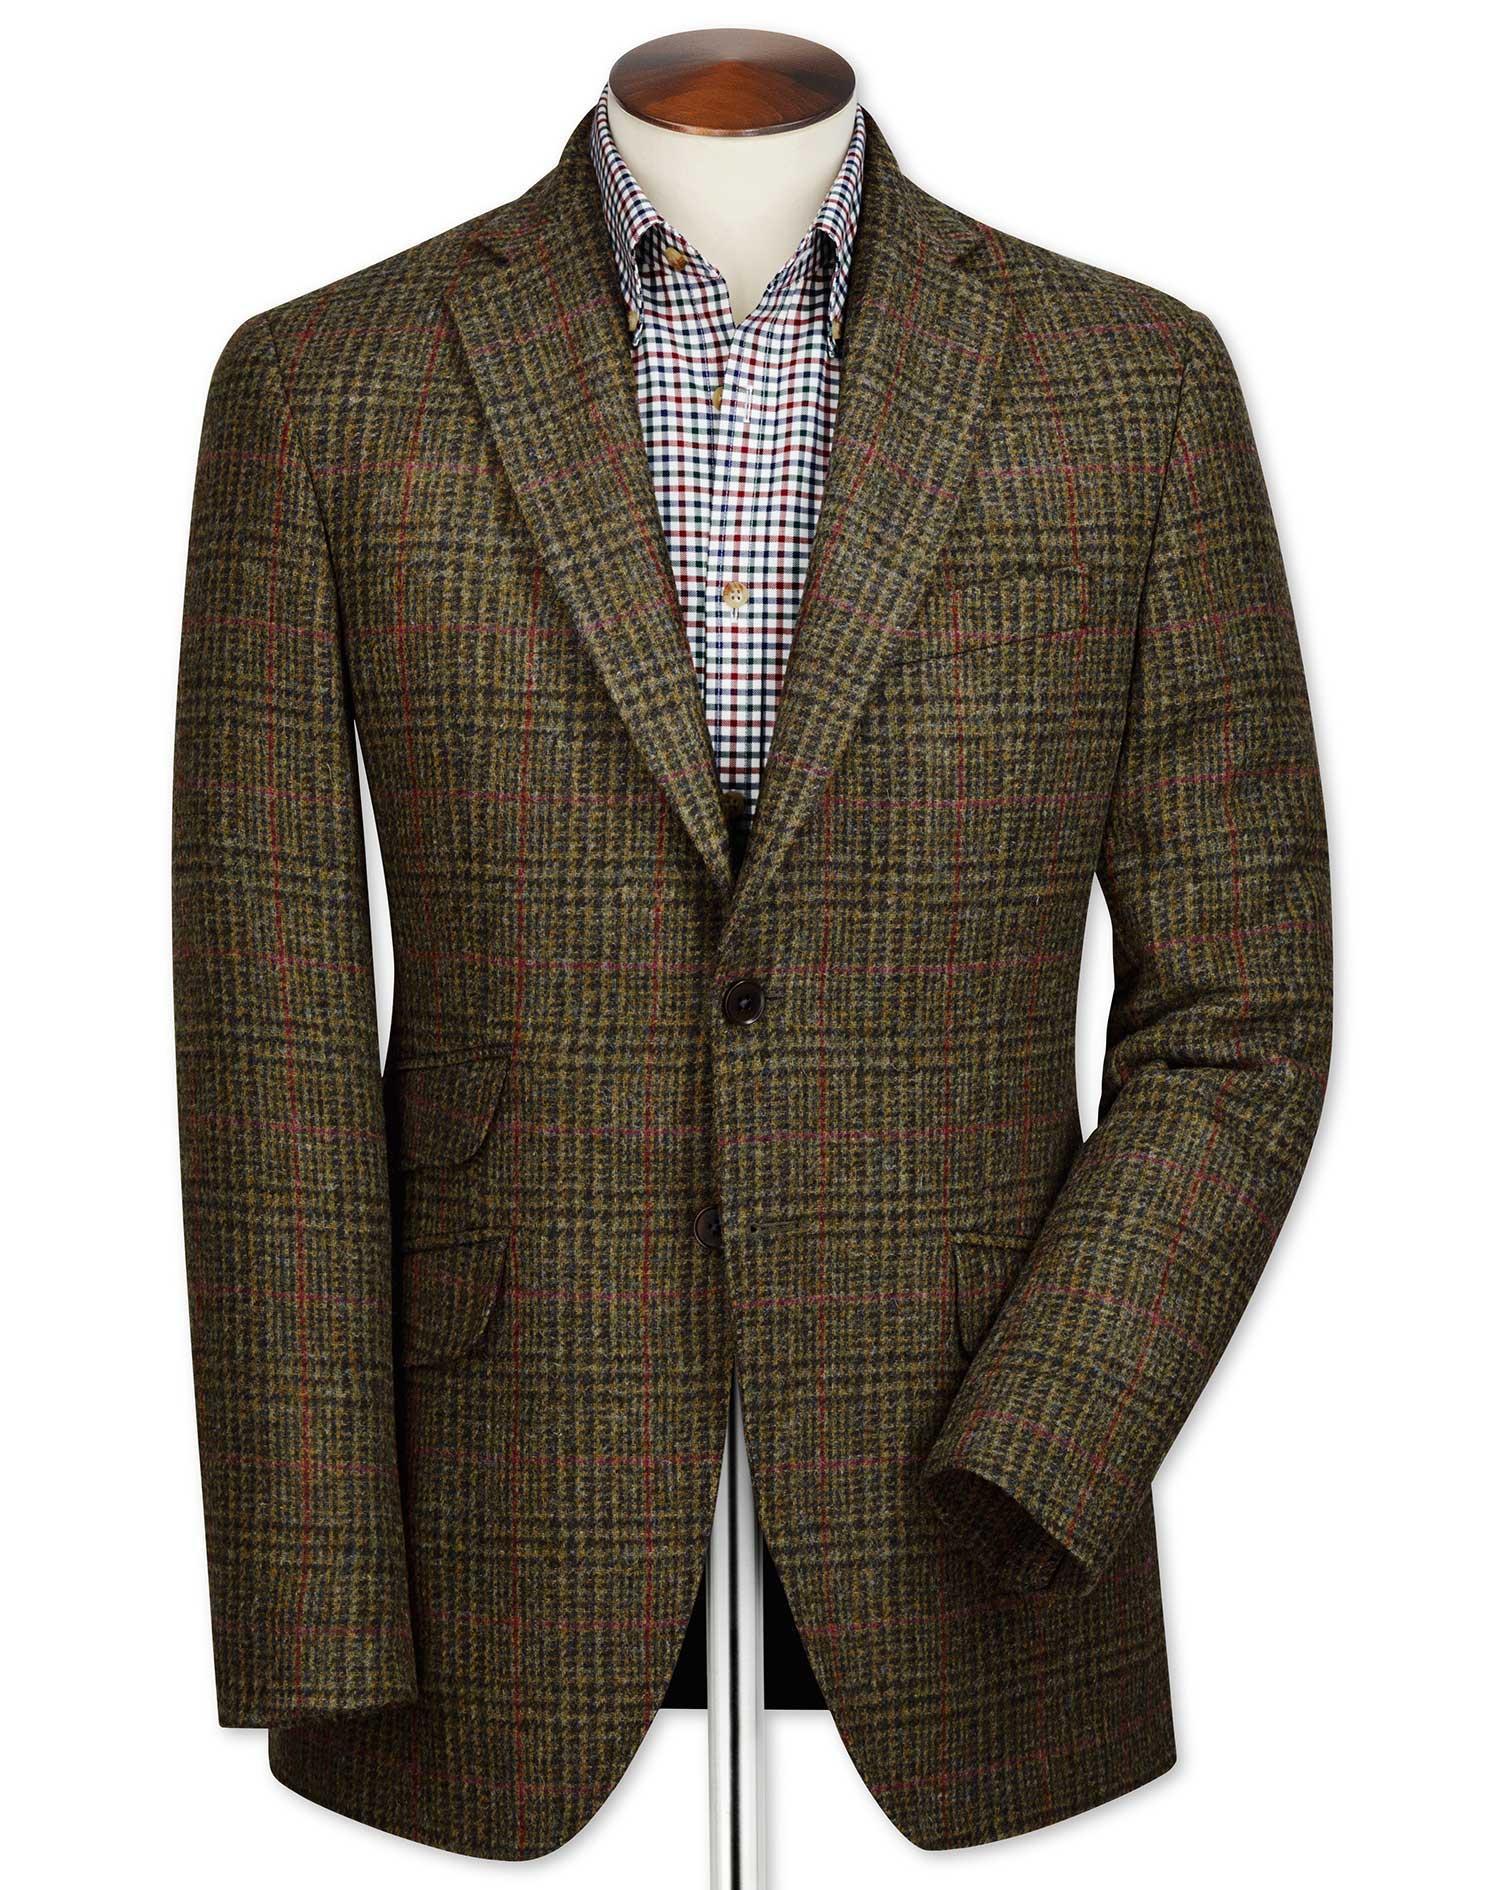 Slim Fit Green Checkered British Tweed Wool Jacket Size 38 Regular by Charles Tyrwhitt